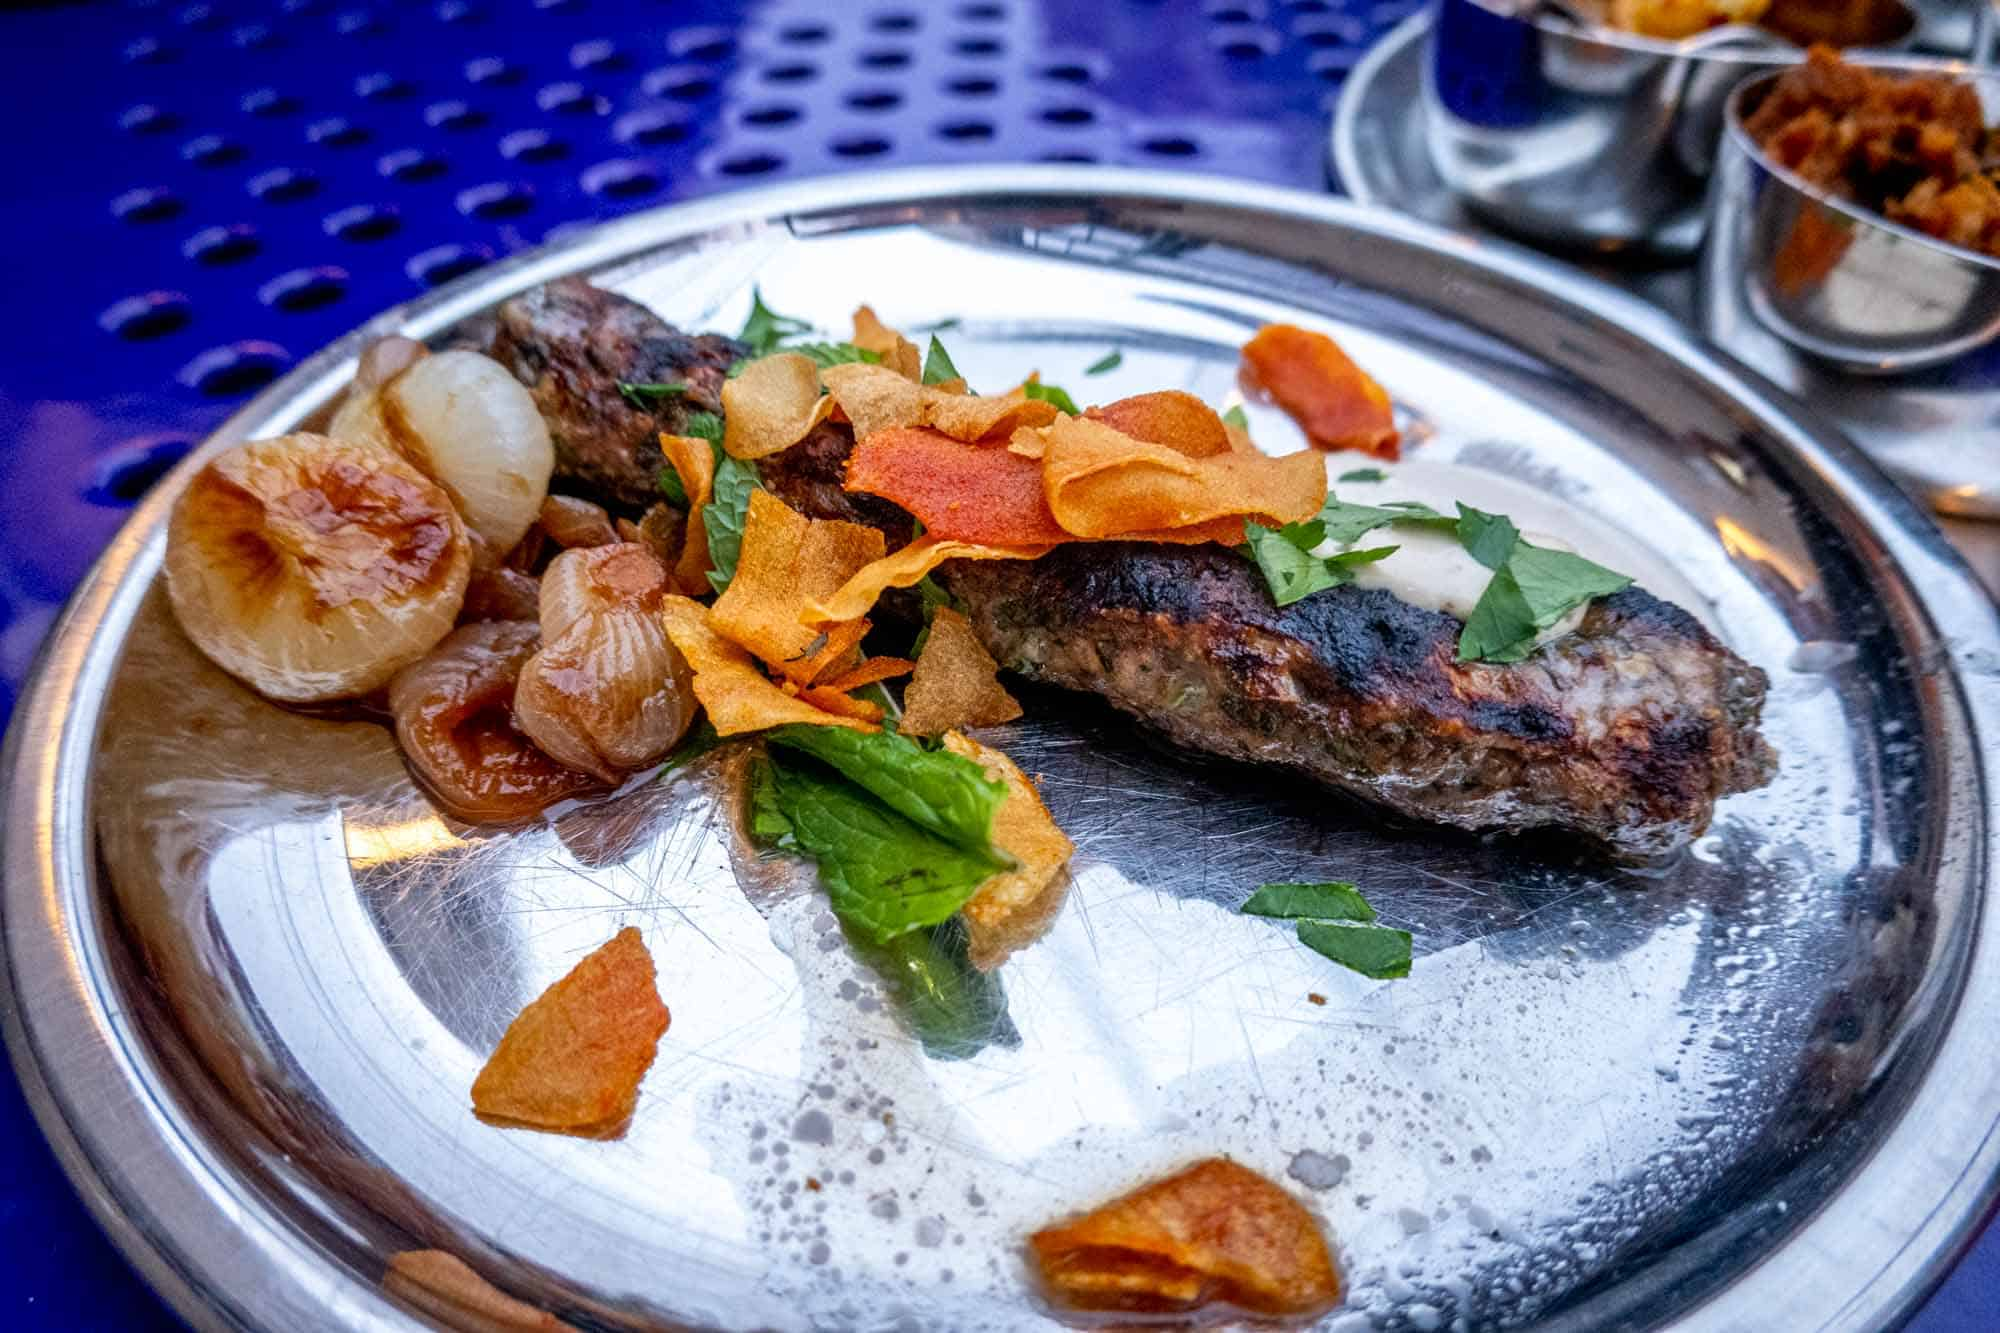 Lamb kofte on steel plate